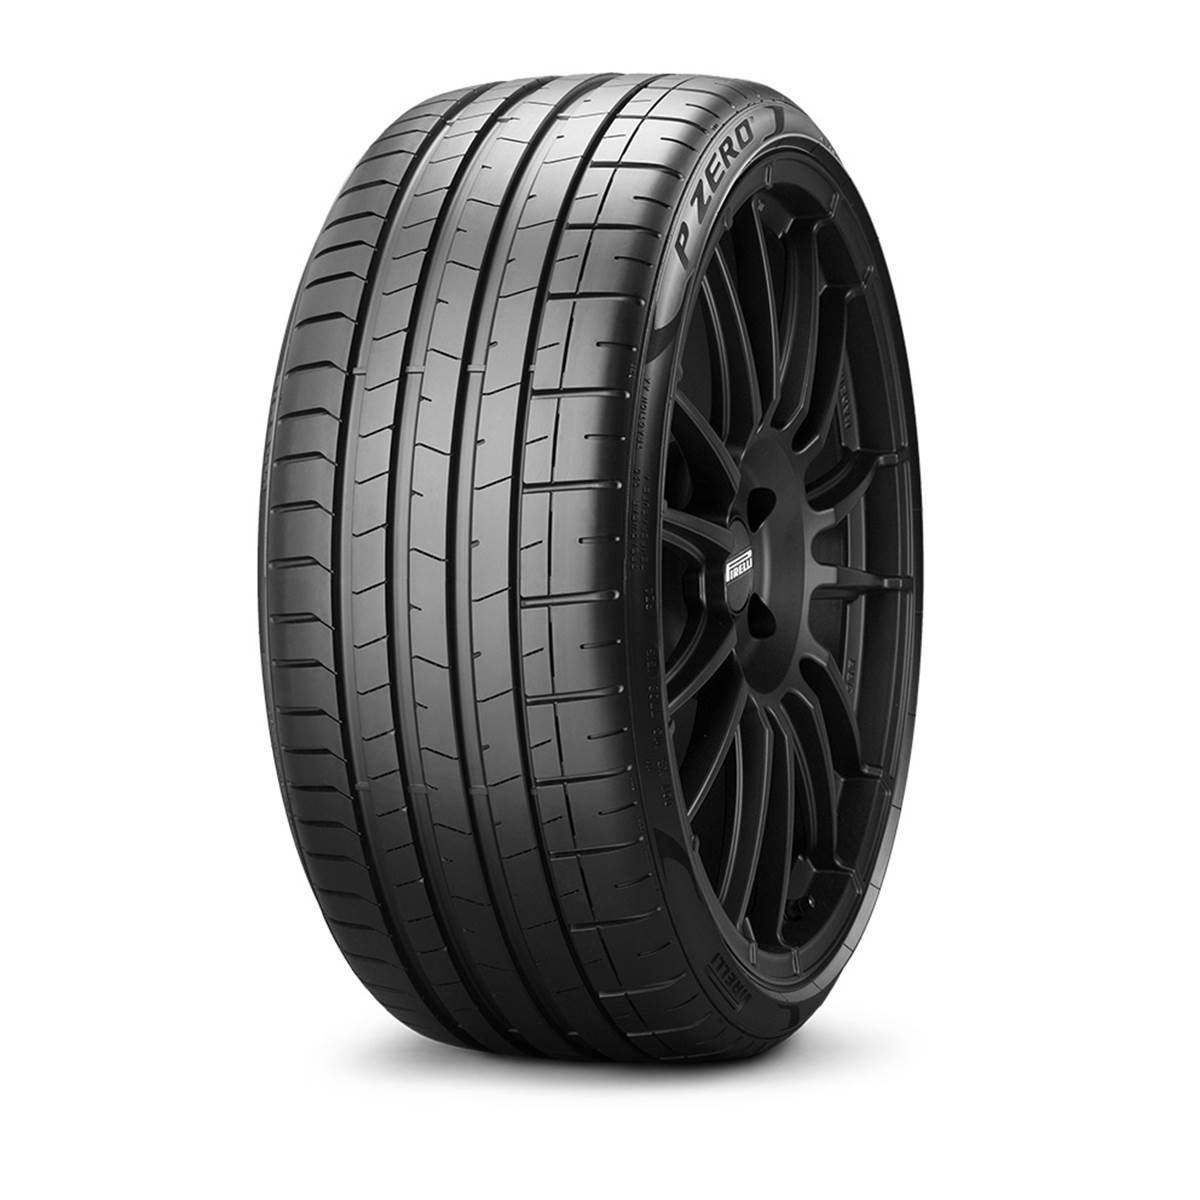 Pneu Pirelli 255/35R20 97Y P-Zero